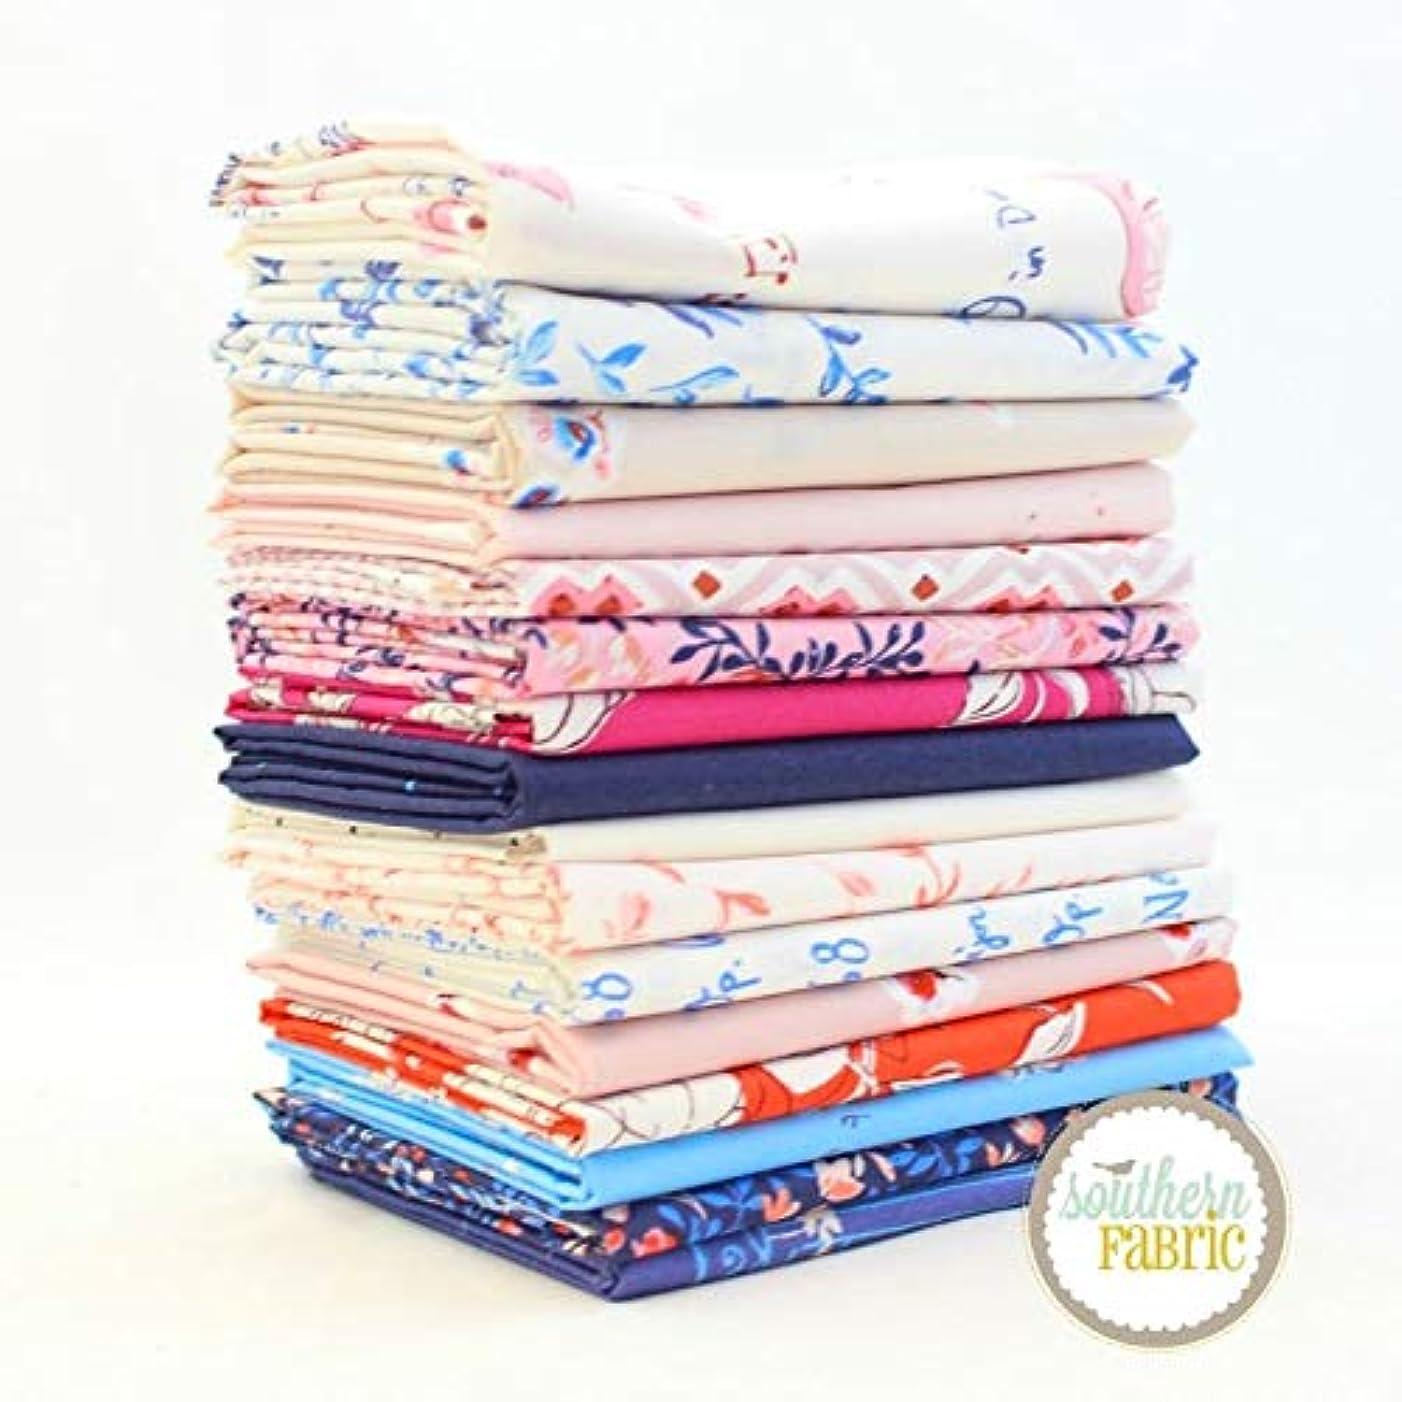 Art Gallery Sonata Fat Quarter Bundle (16 pcs) by Amy Sinibaldi 18 x 21 inches (45.72cm x 53.34cm) Fabric cuts DIY Quilt Fabric